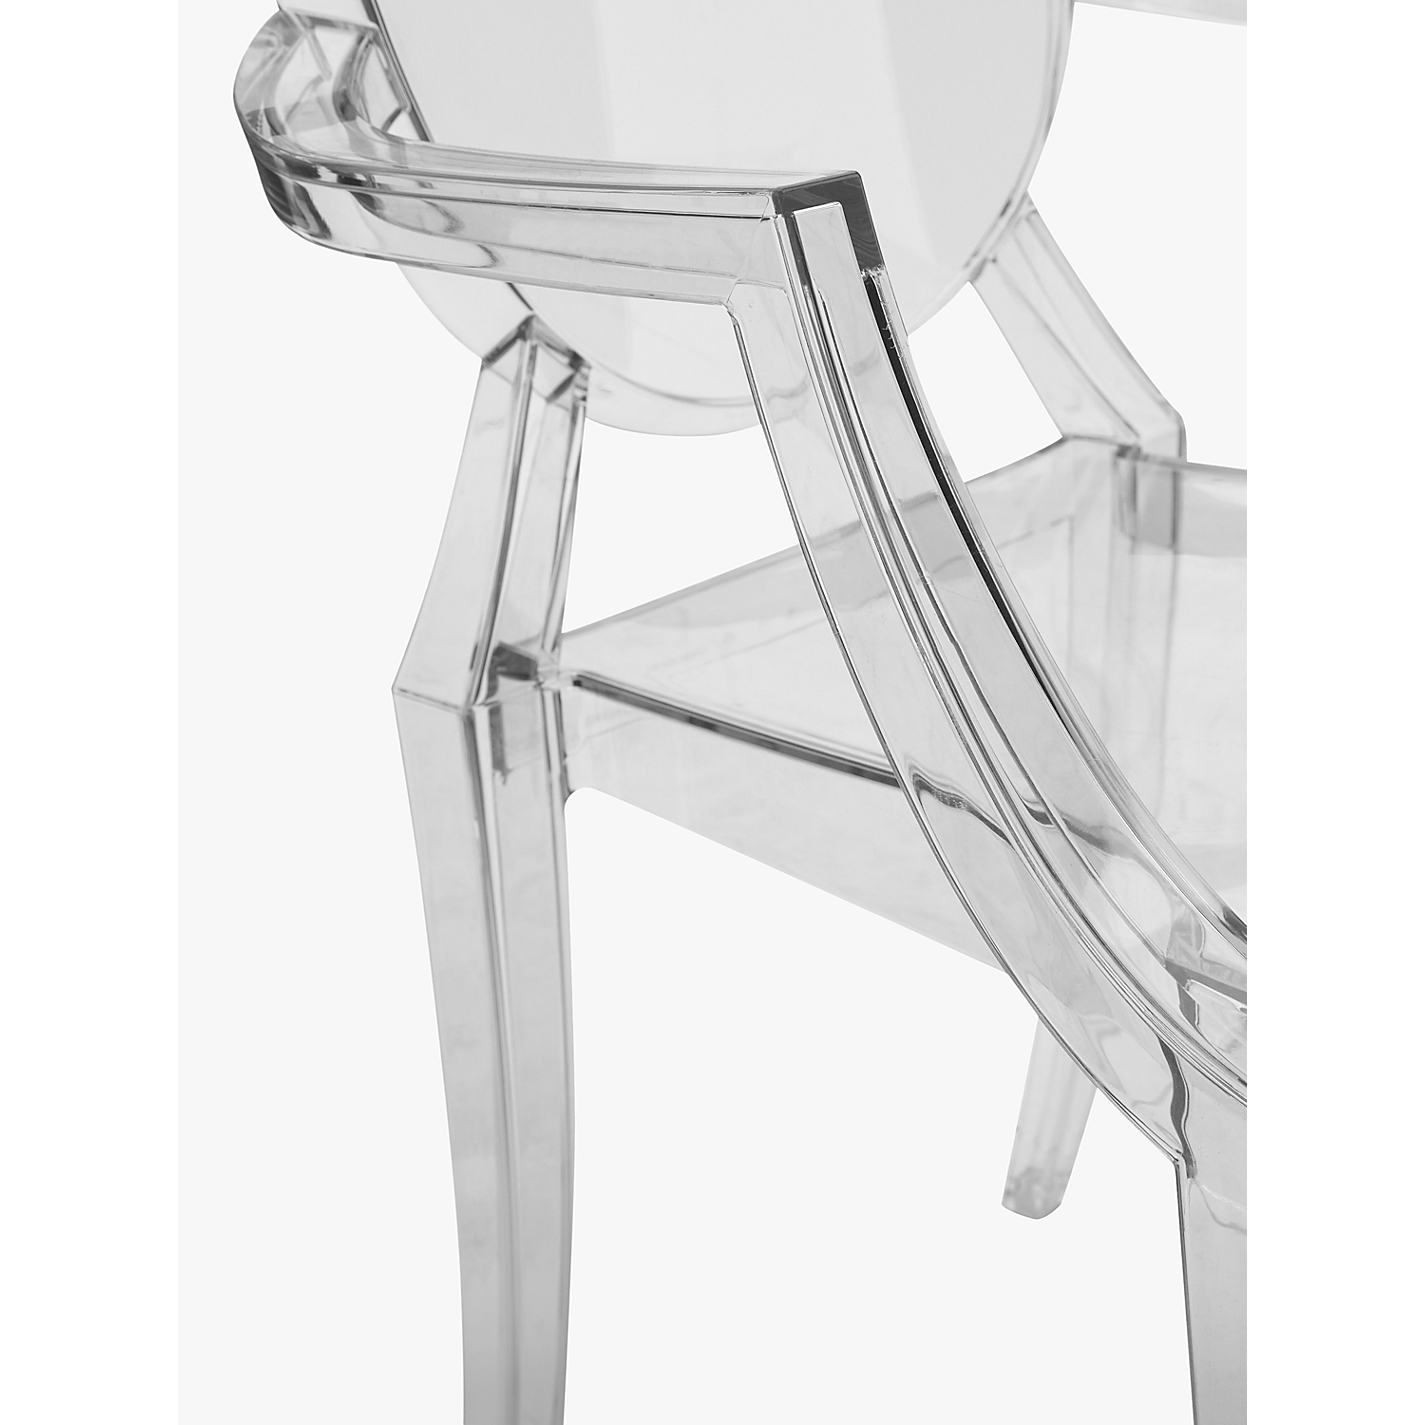 Buy Philippe Starck for Kartell Louis Ghost Chair | John Lewis